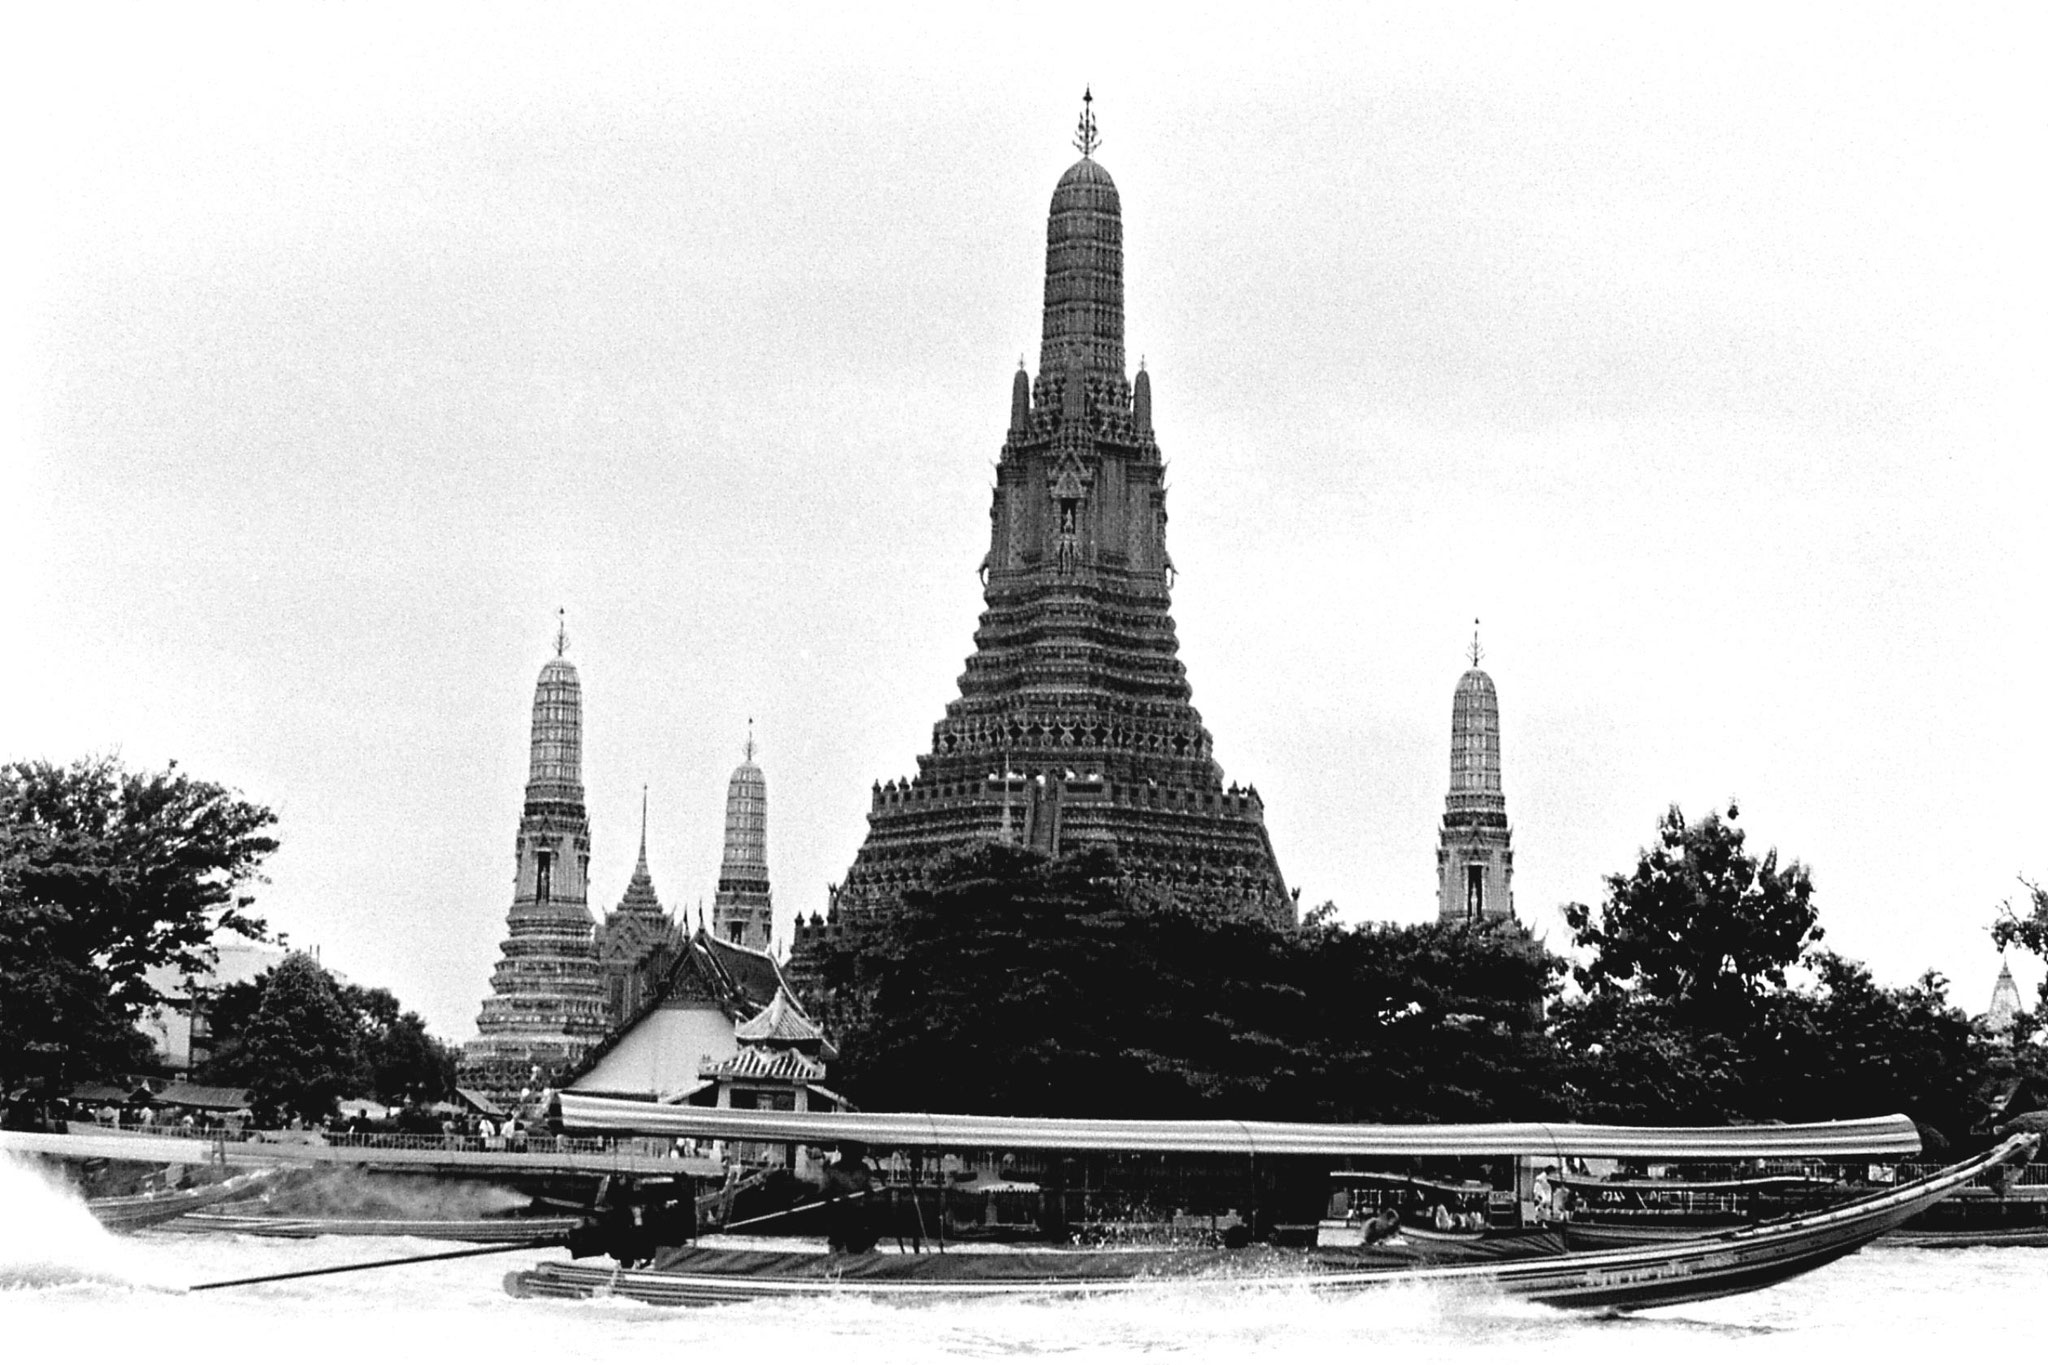 17/6/1990: 22: Bangkok, on the river Wat Arun Temple of Dawn